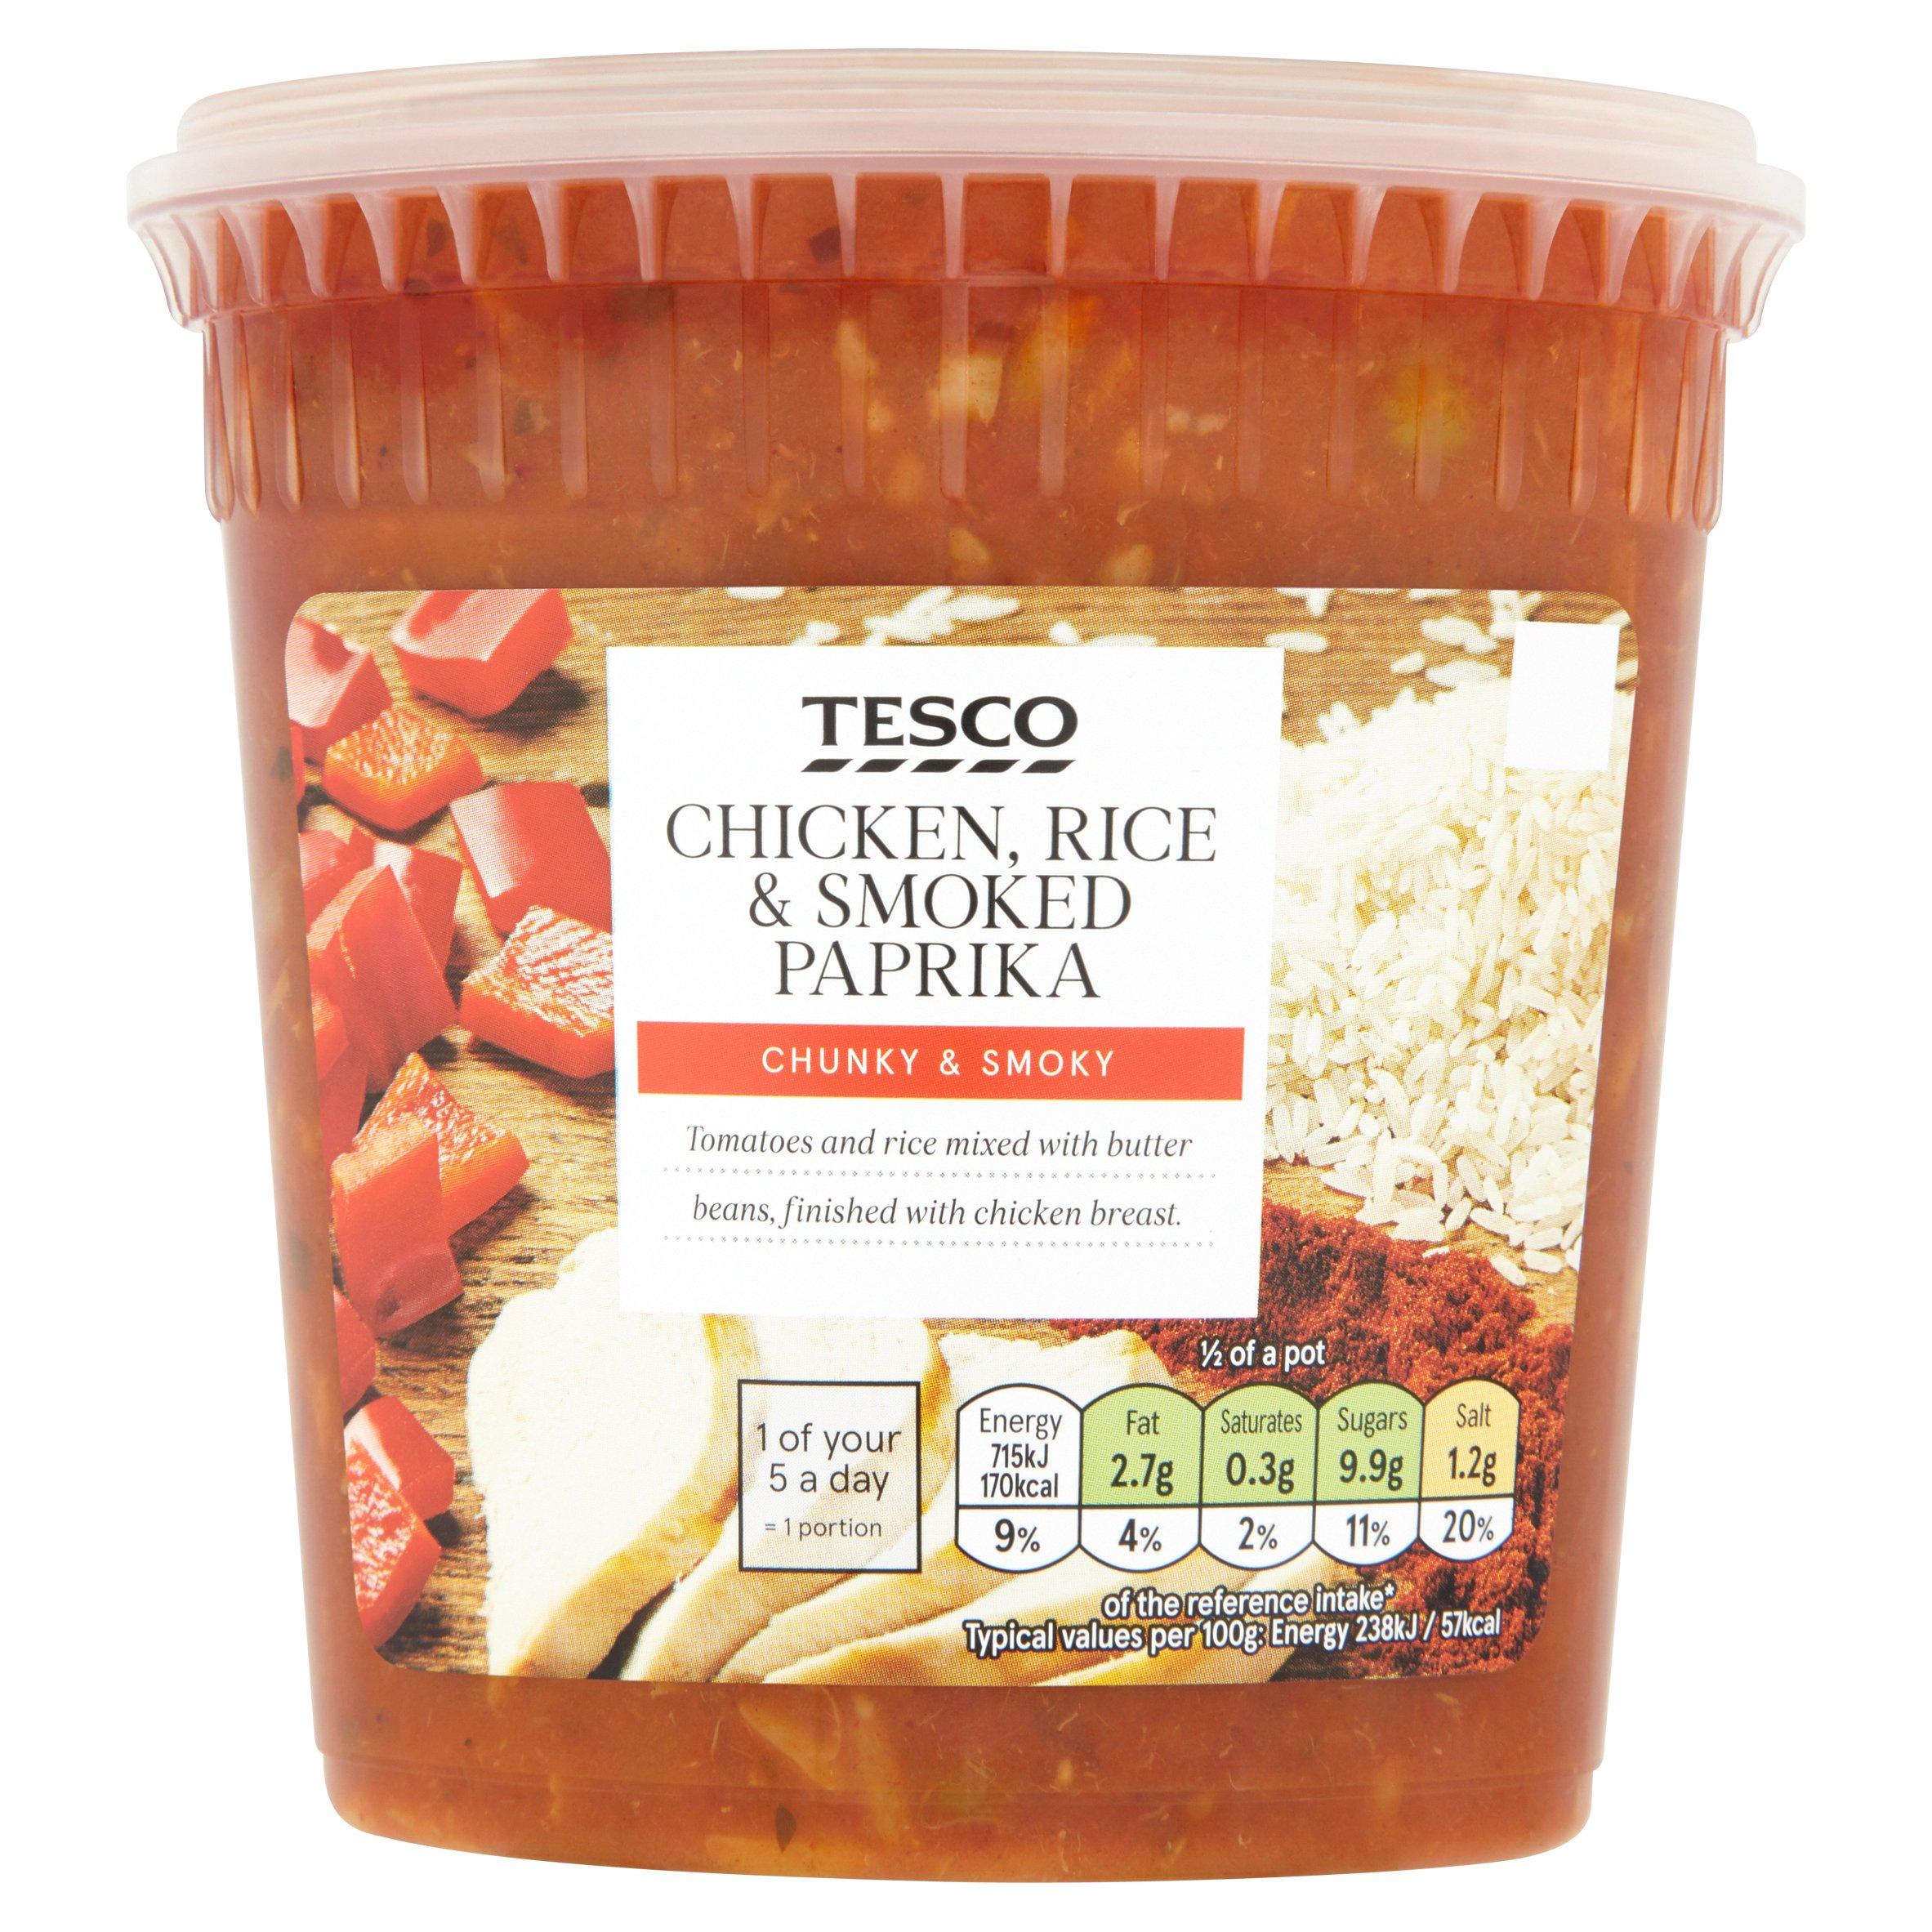 Tesco Chicken Rice, Paprika & Rice Soup 600G